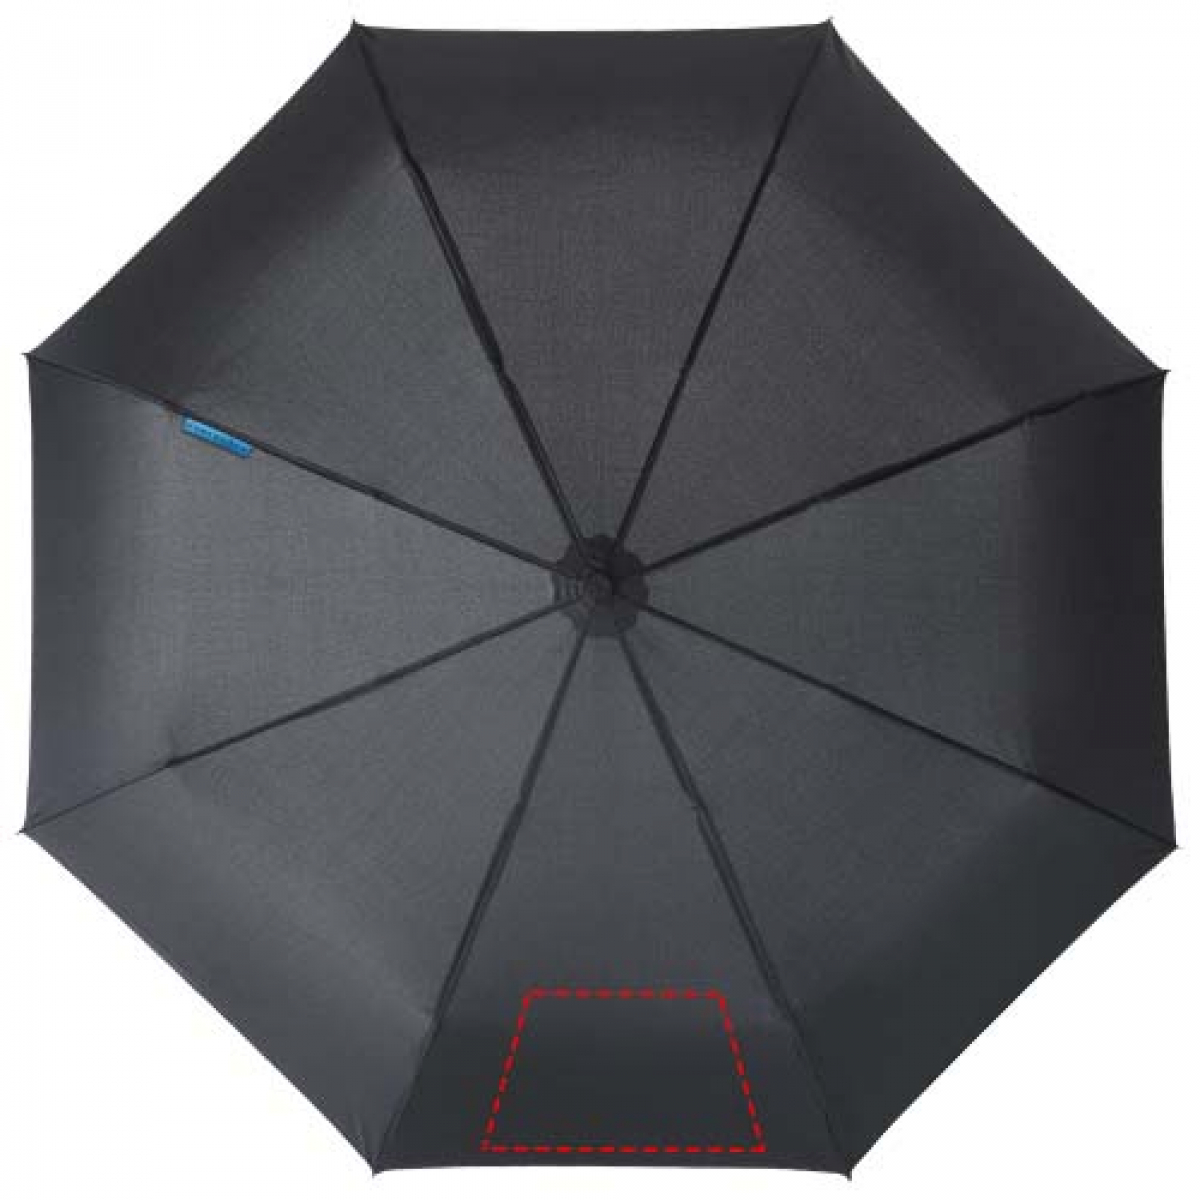 Marksman 3-delige opvouwbare paraplu - 3de paneel